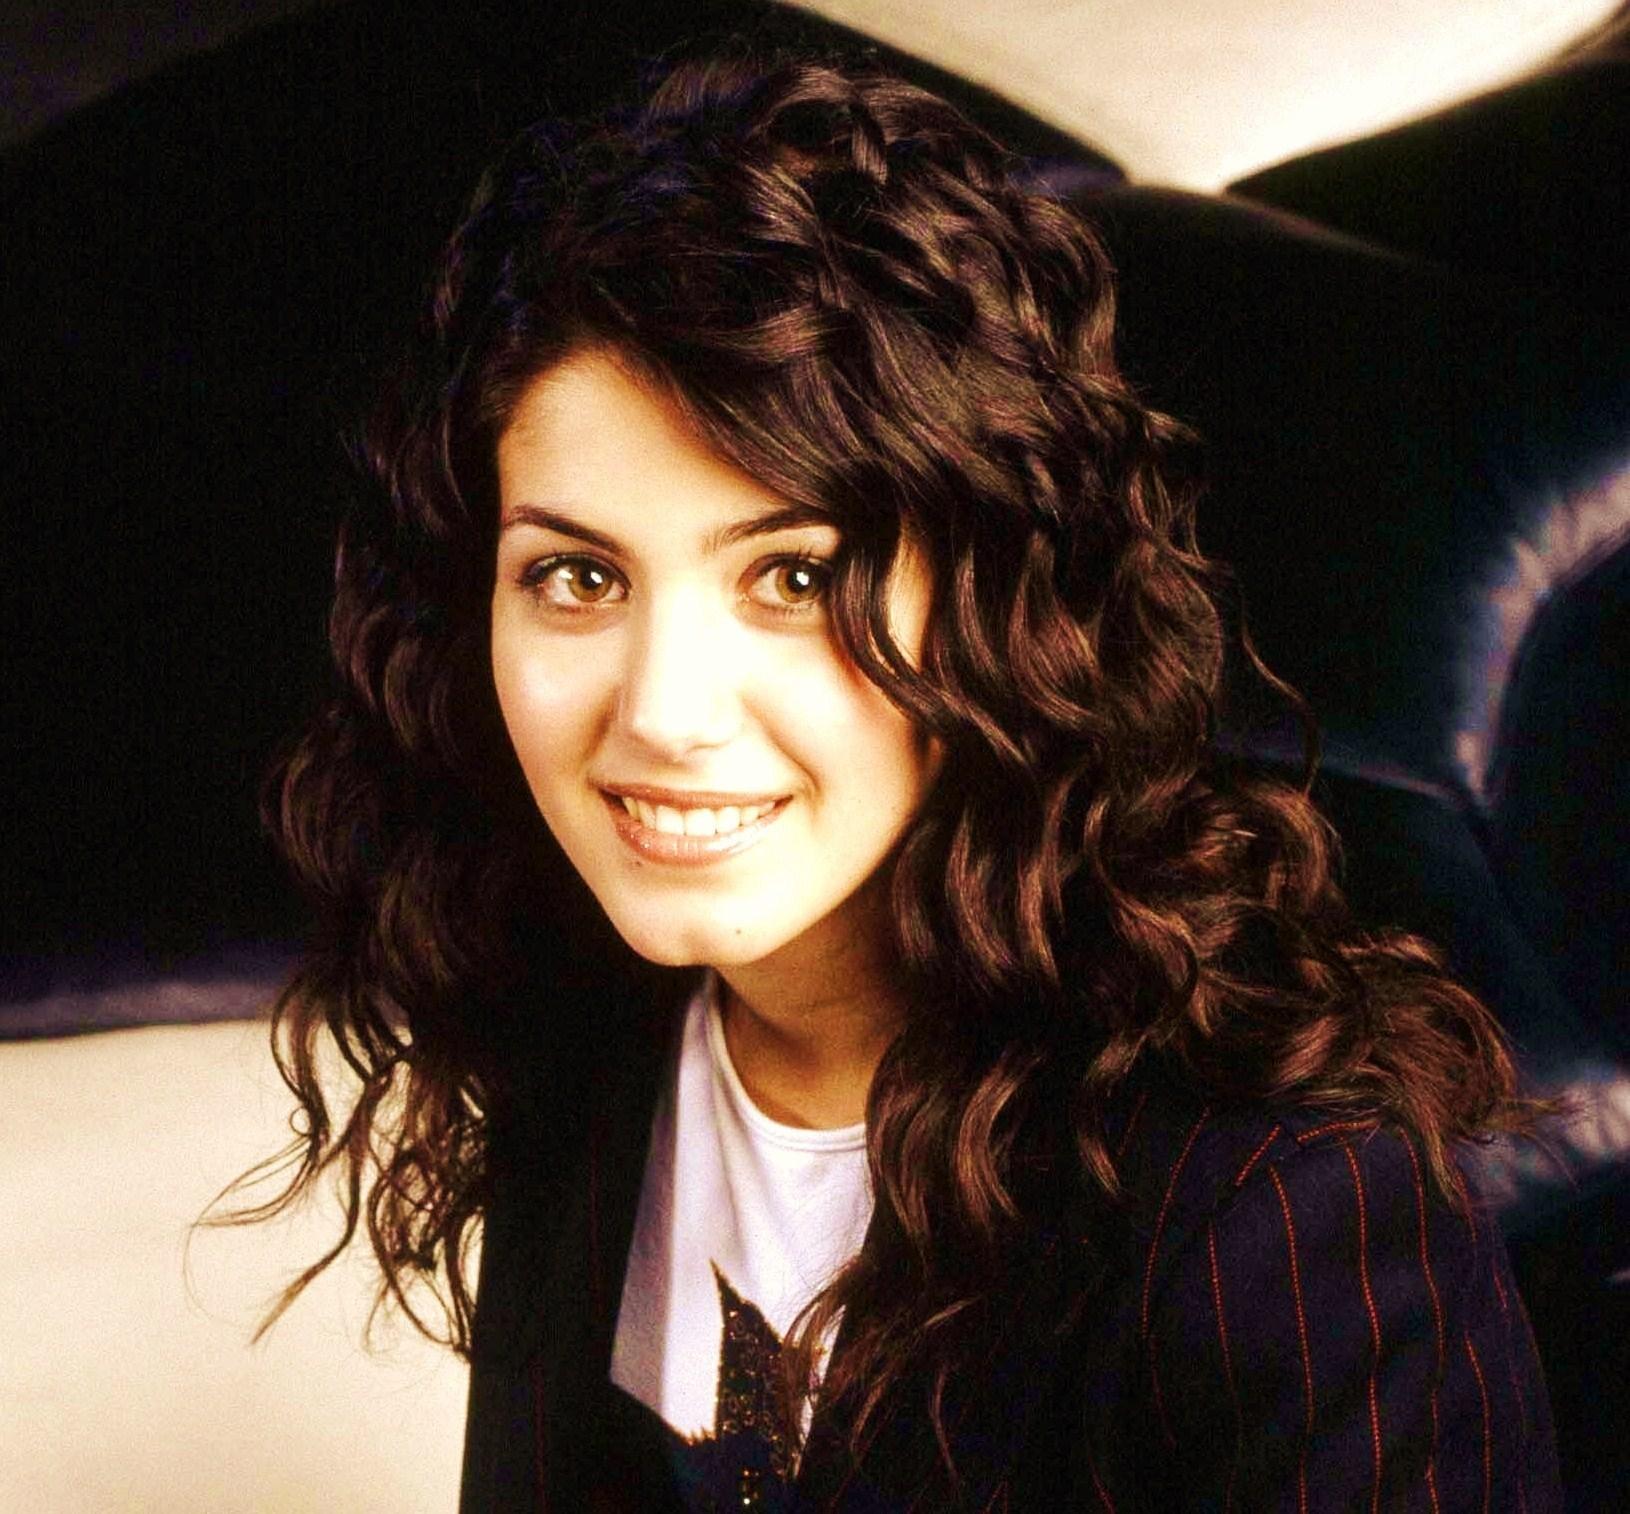 Katie Melua net worth